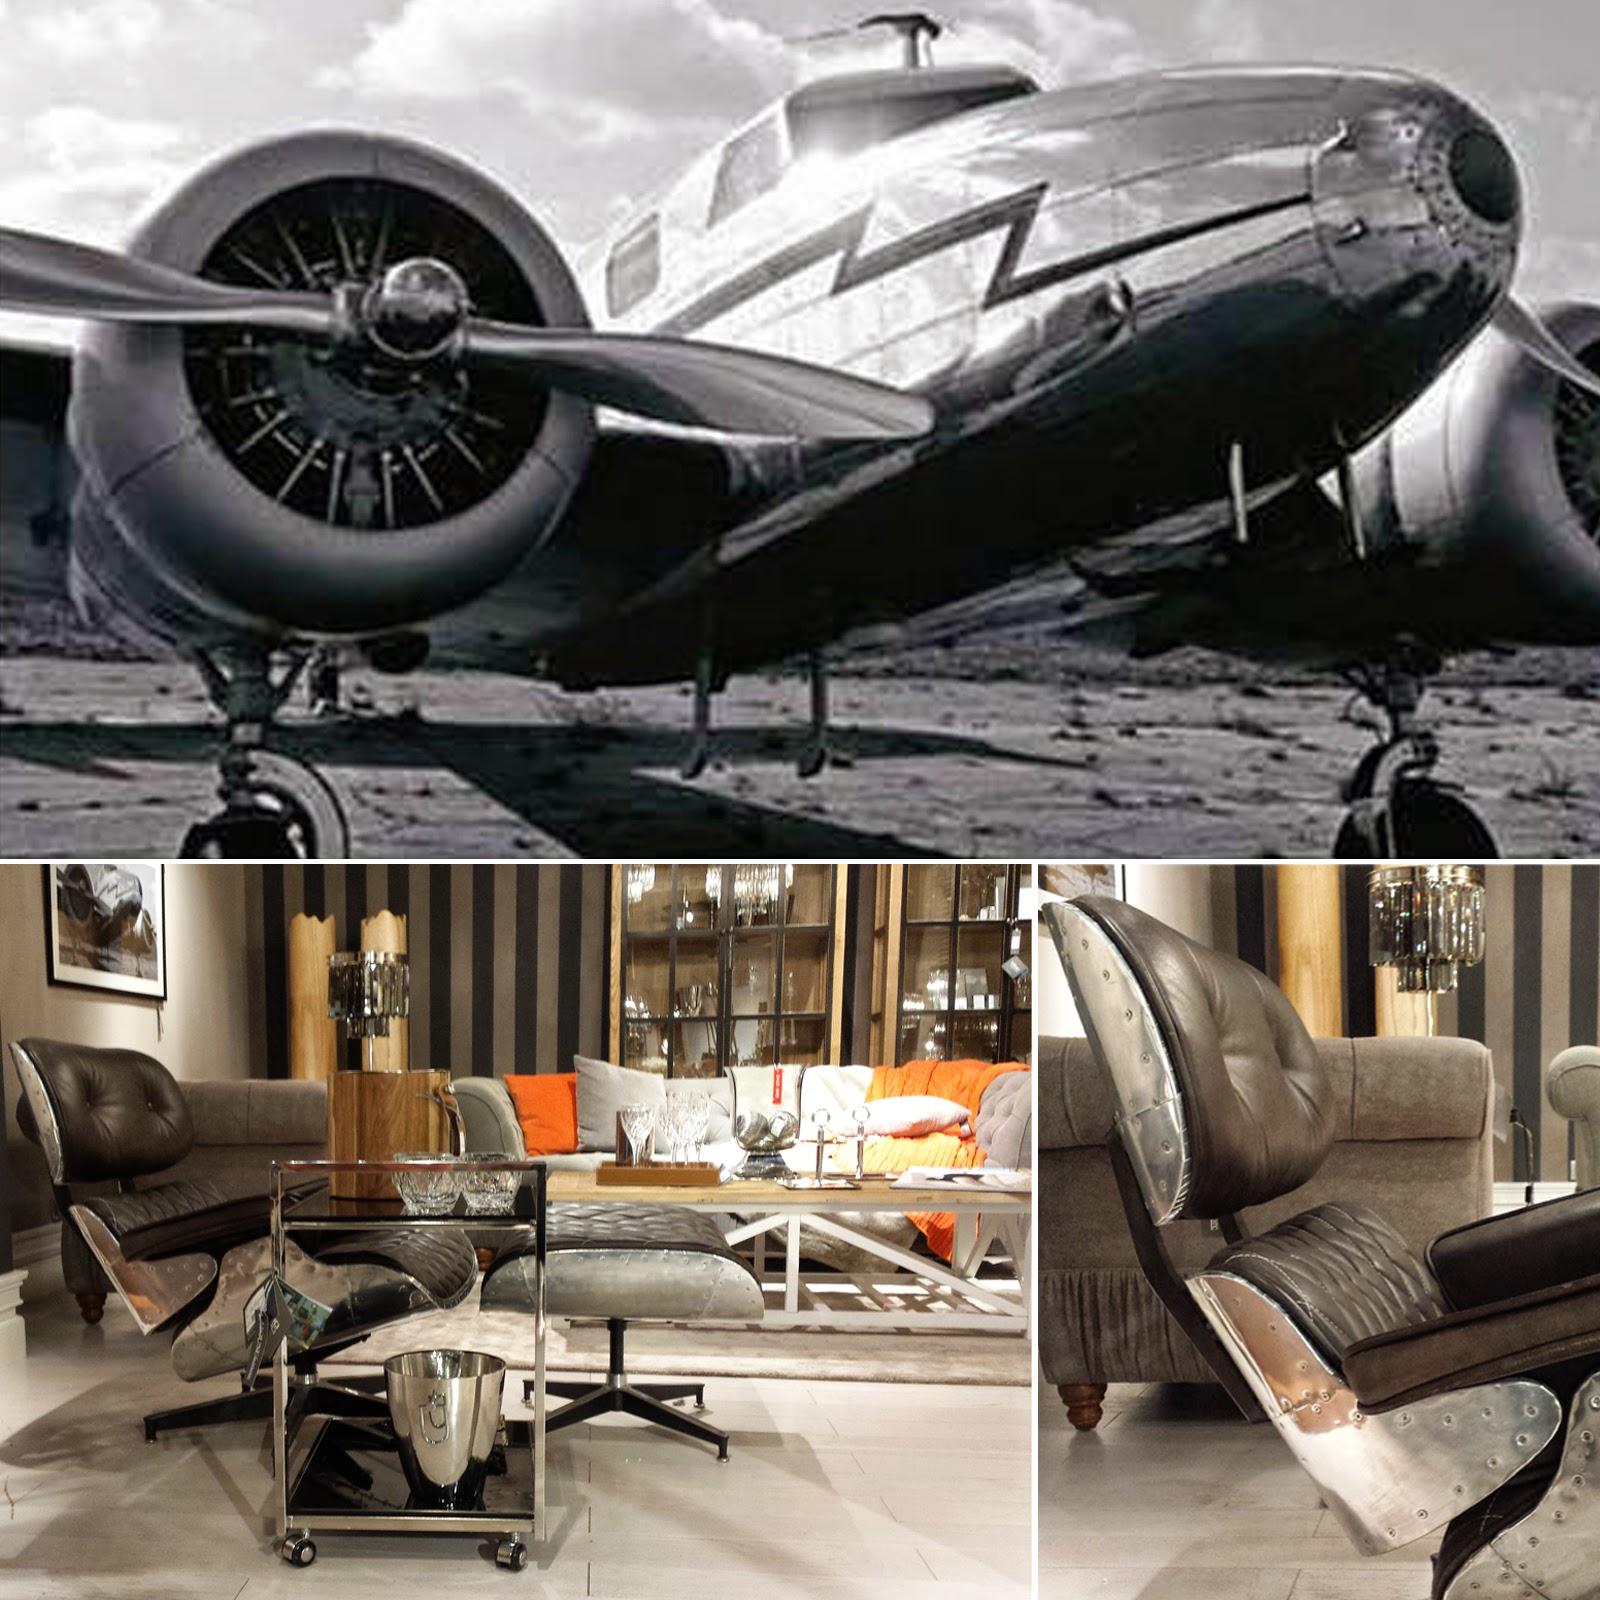 Dacon-Design-interiors-House&More-Miloo-Manutti-Eichholtz-Flamat-Pomax-Riviera Maison-Grand Design-meble skandynawskie-ogrodowe-czarno-białe-fotografie